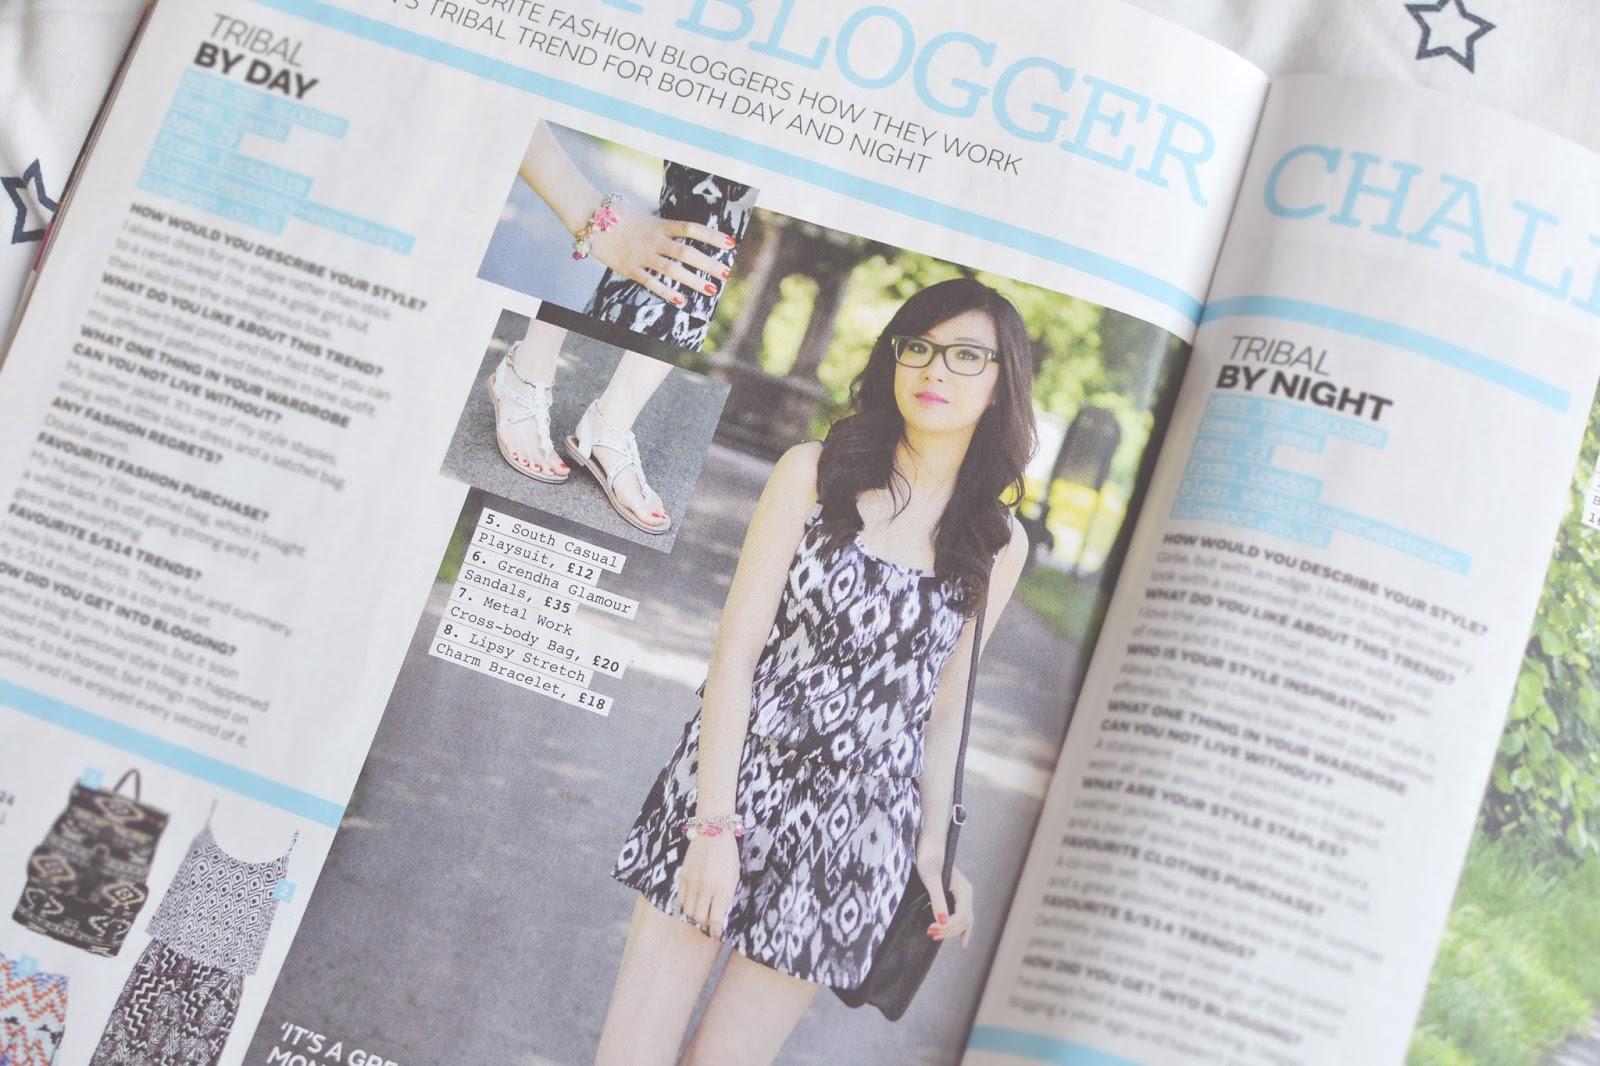 british fashion blogger, uk fashion blog, magazine press coverage fashion blog